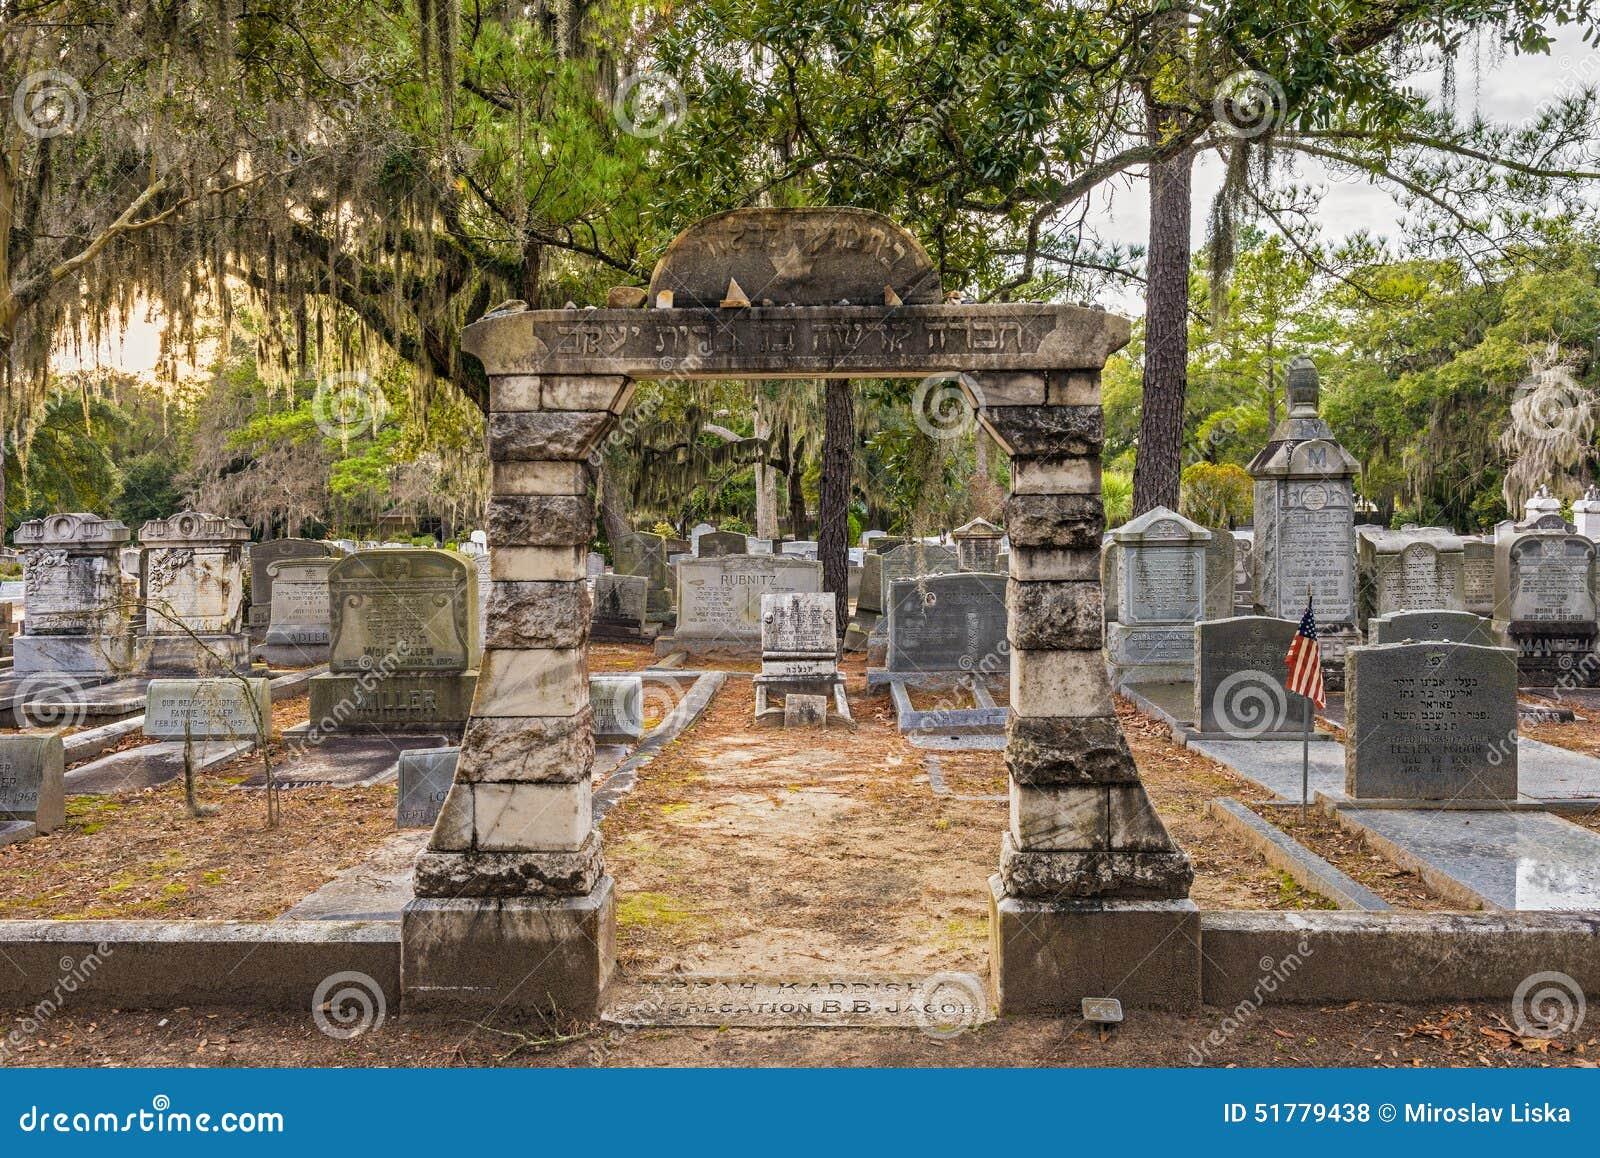 Bonaventure cmentarz w sawannie, Gruzja